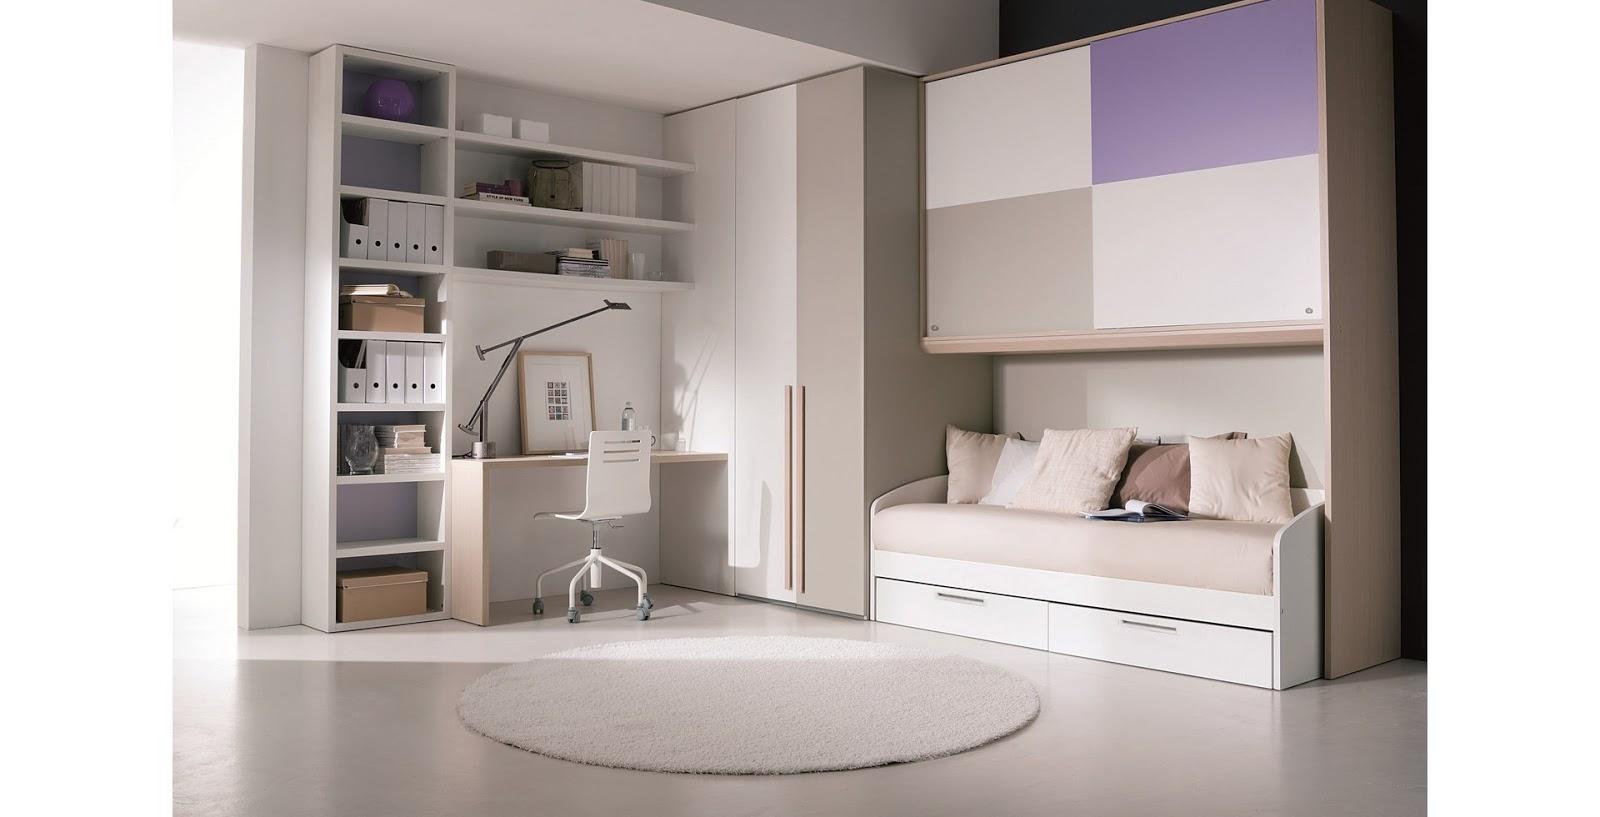 Bonetti camerette bonetti bedrooms camerette dielle - Camerette bambini moderne ...